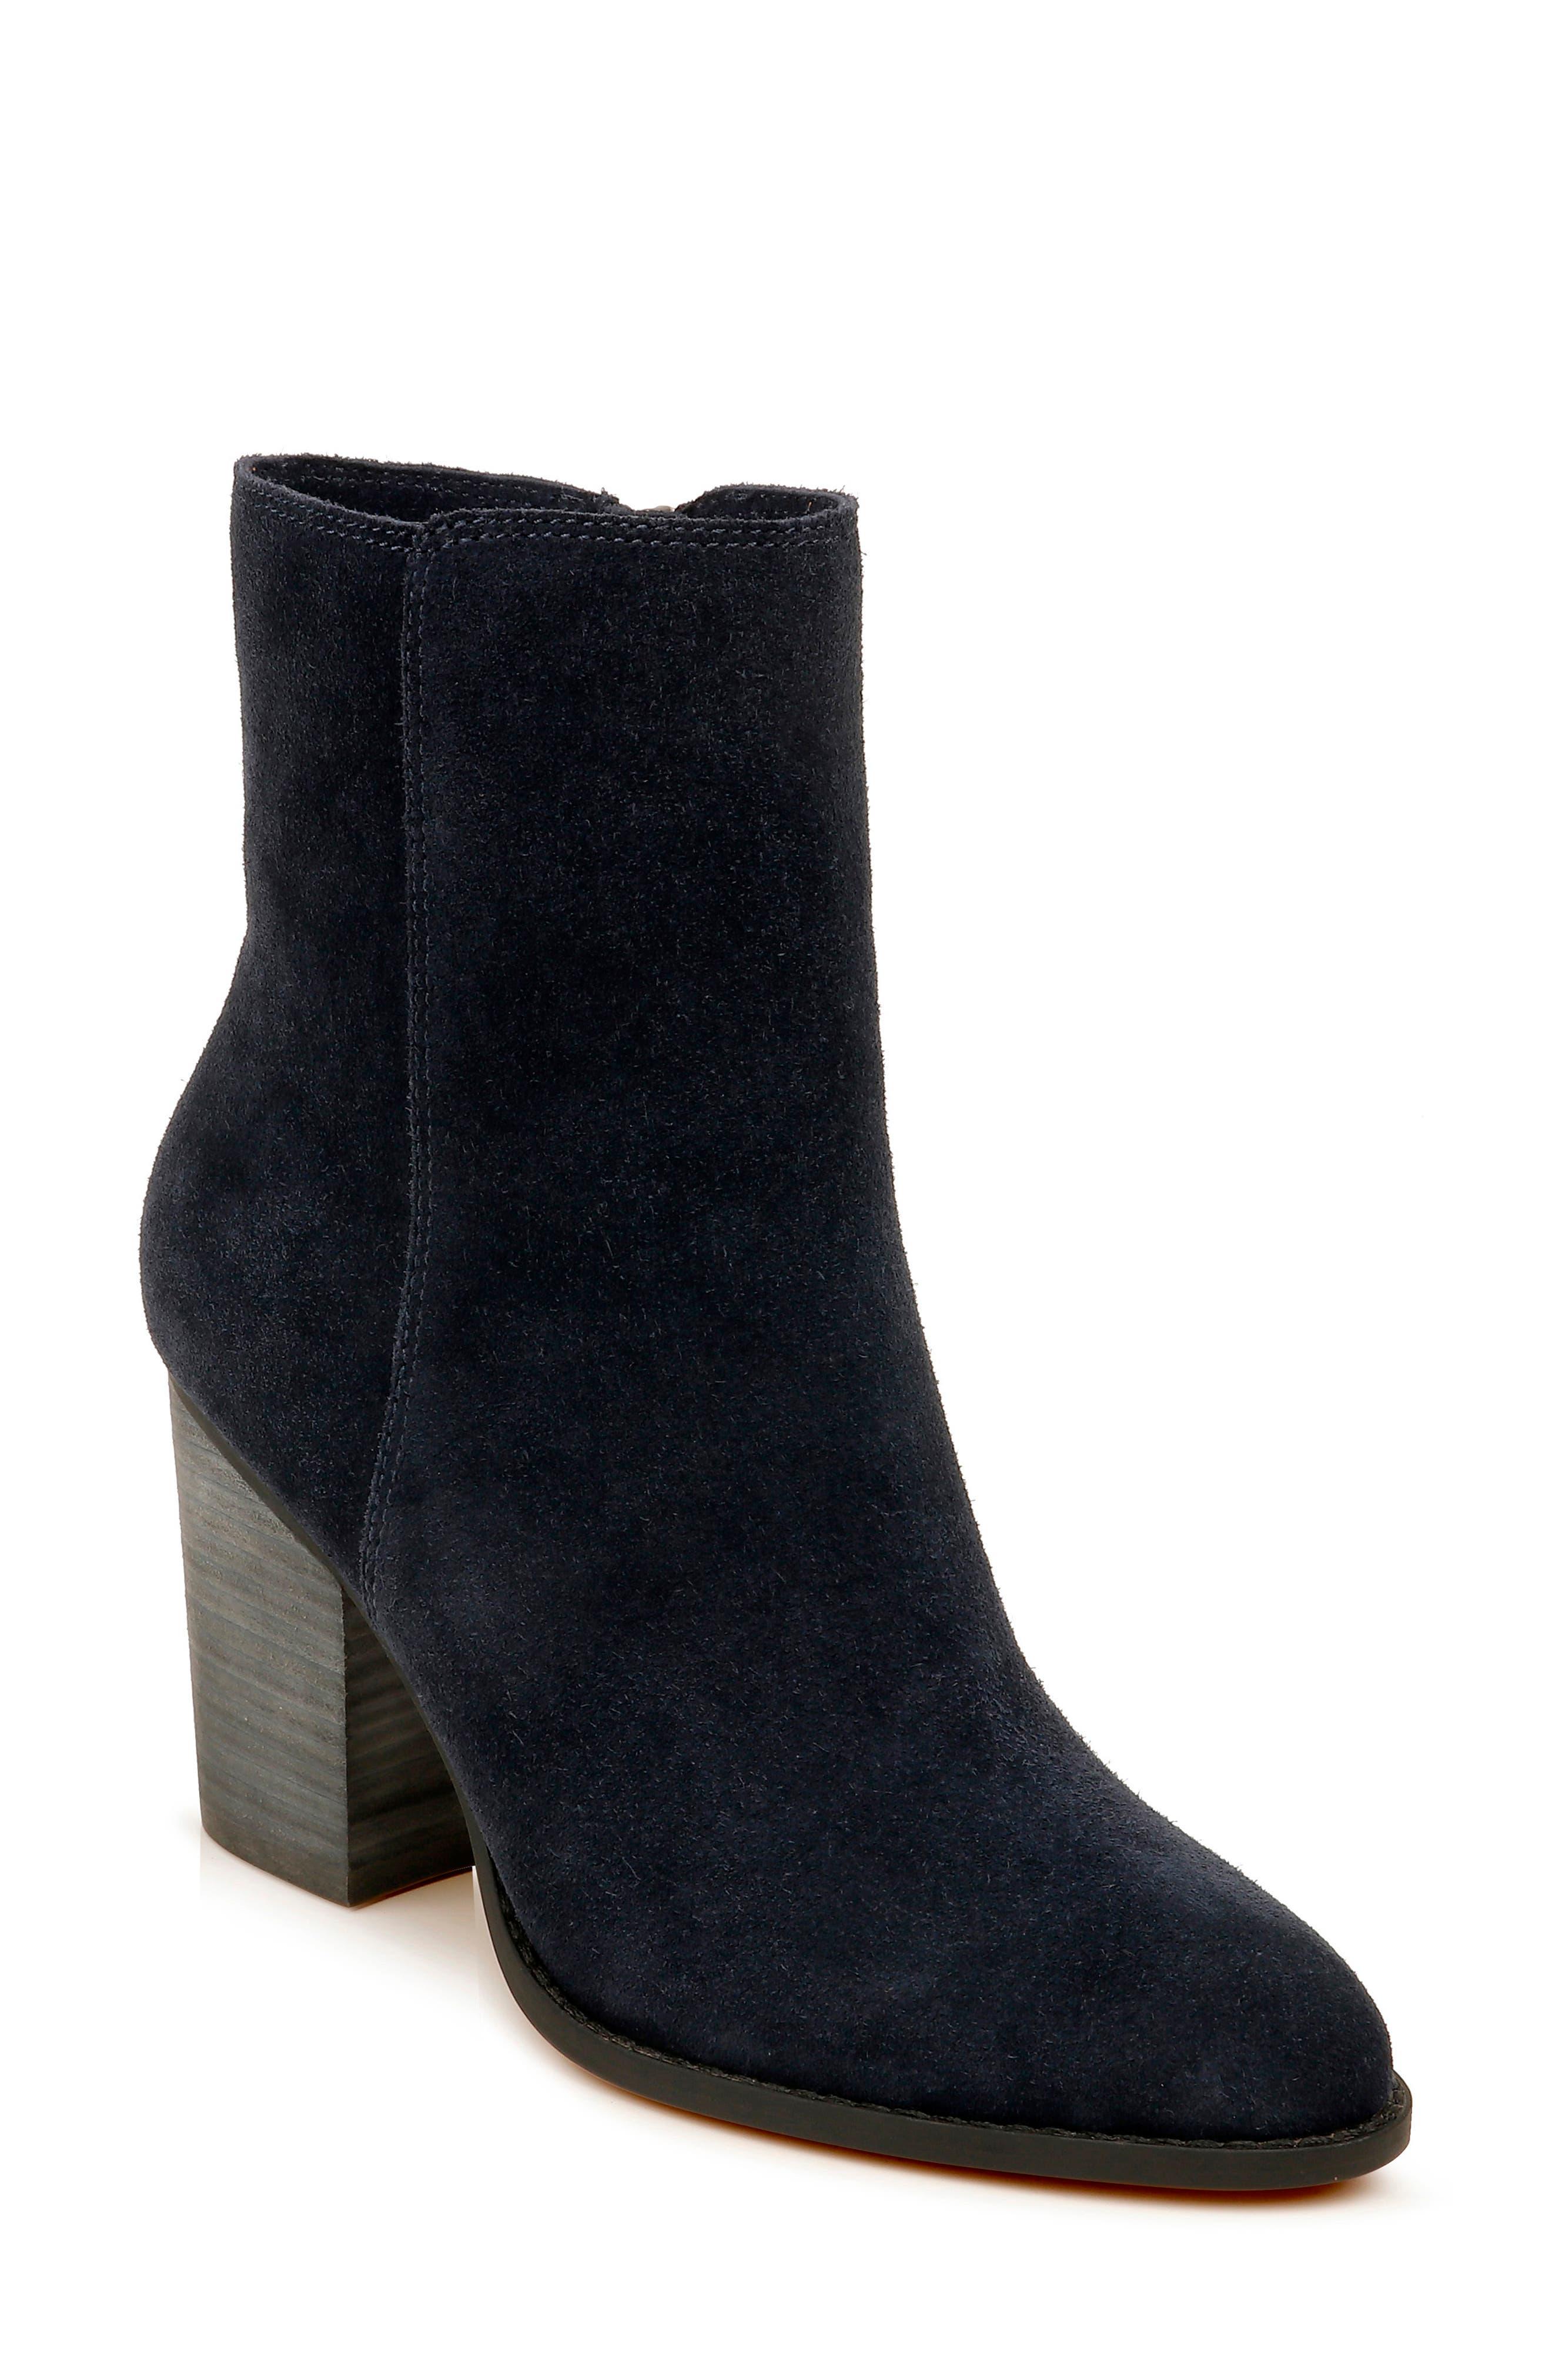 Splendid Booties \u0026 Ankle Boots | Nordstrom